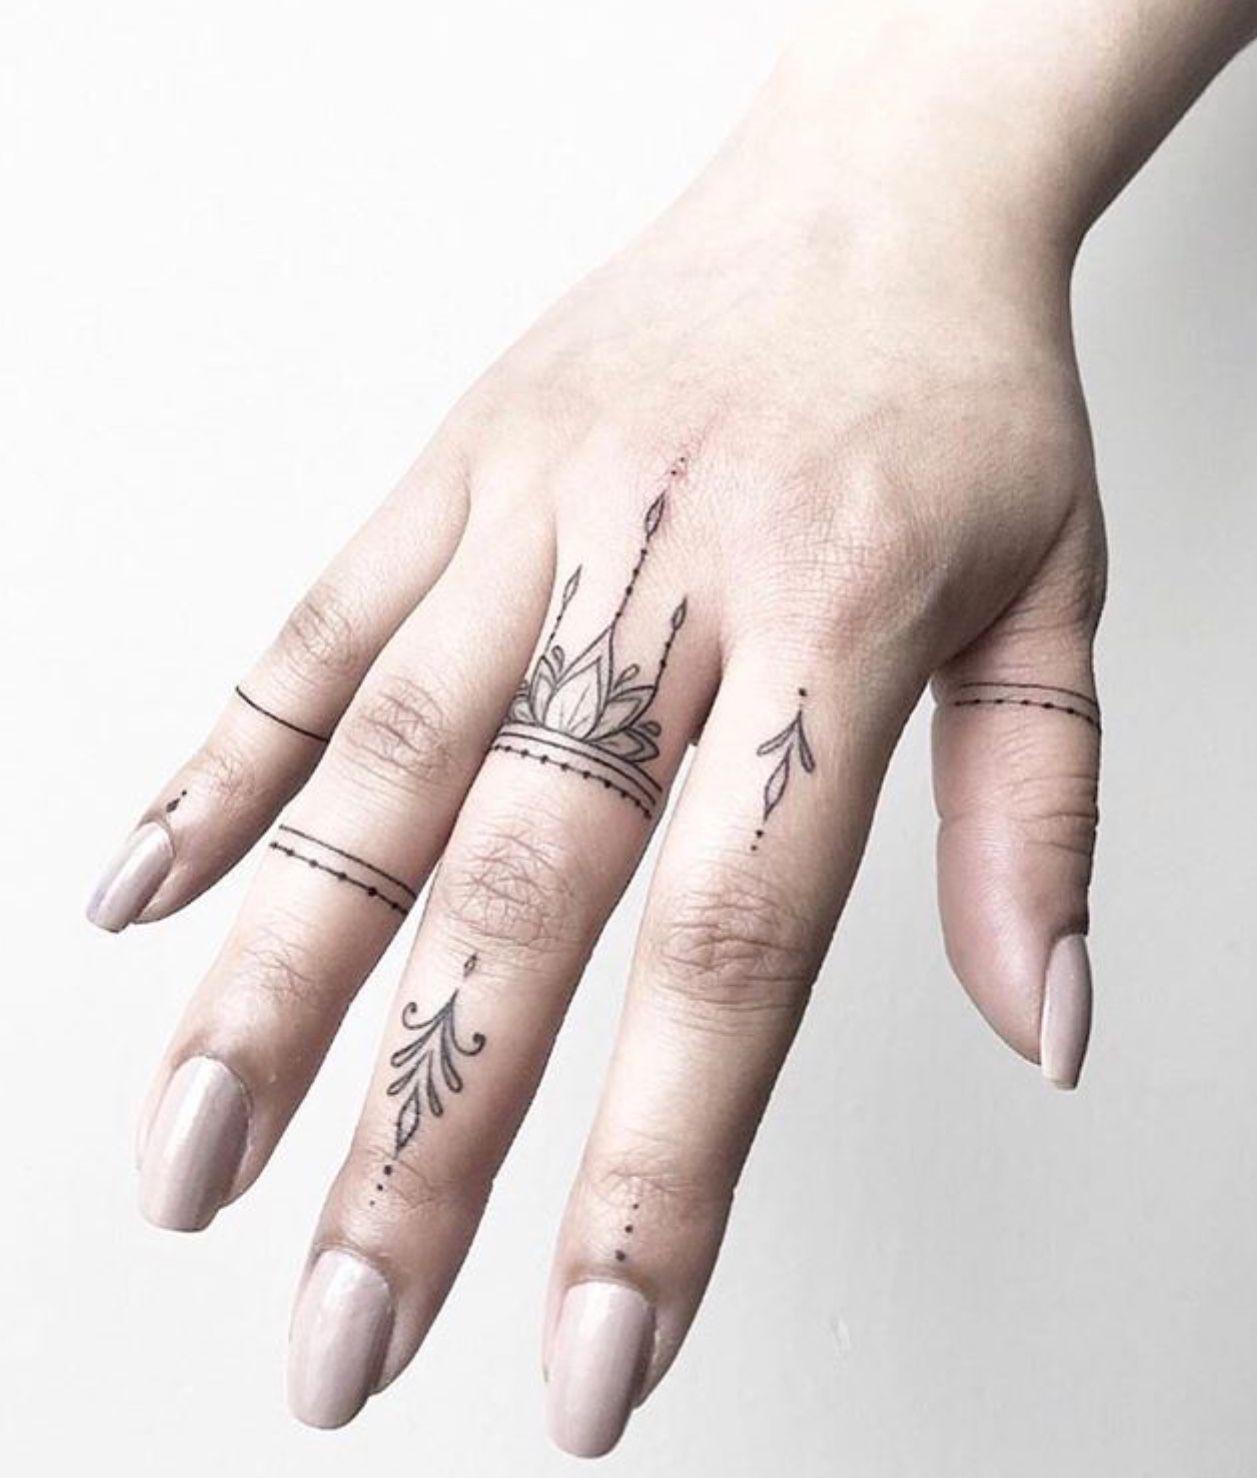 Pin By Lia Harris On Tattoo Cute Finger Tattoos Hand Tattoos For Women Finger Tattoo Designs